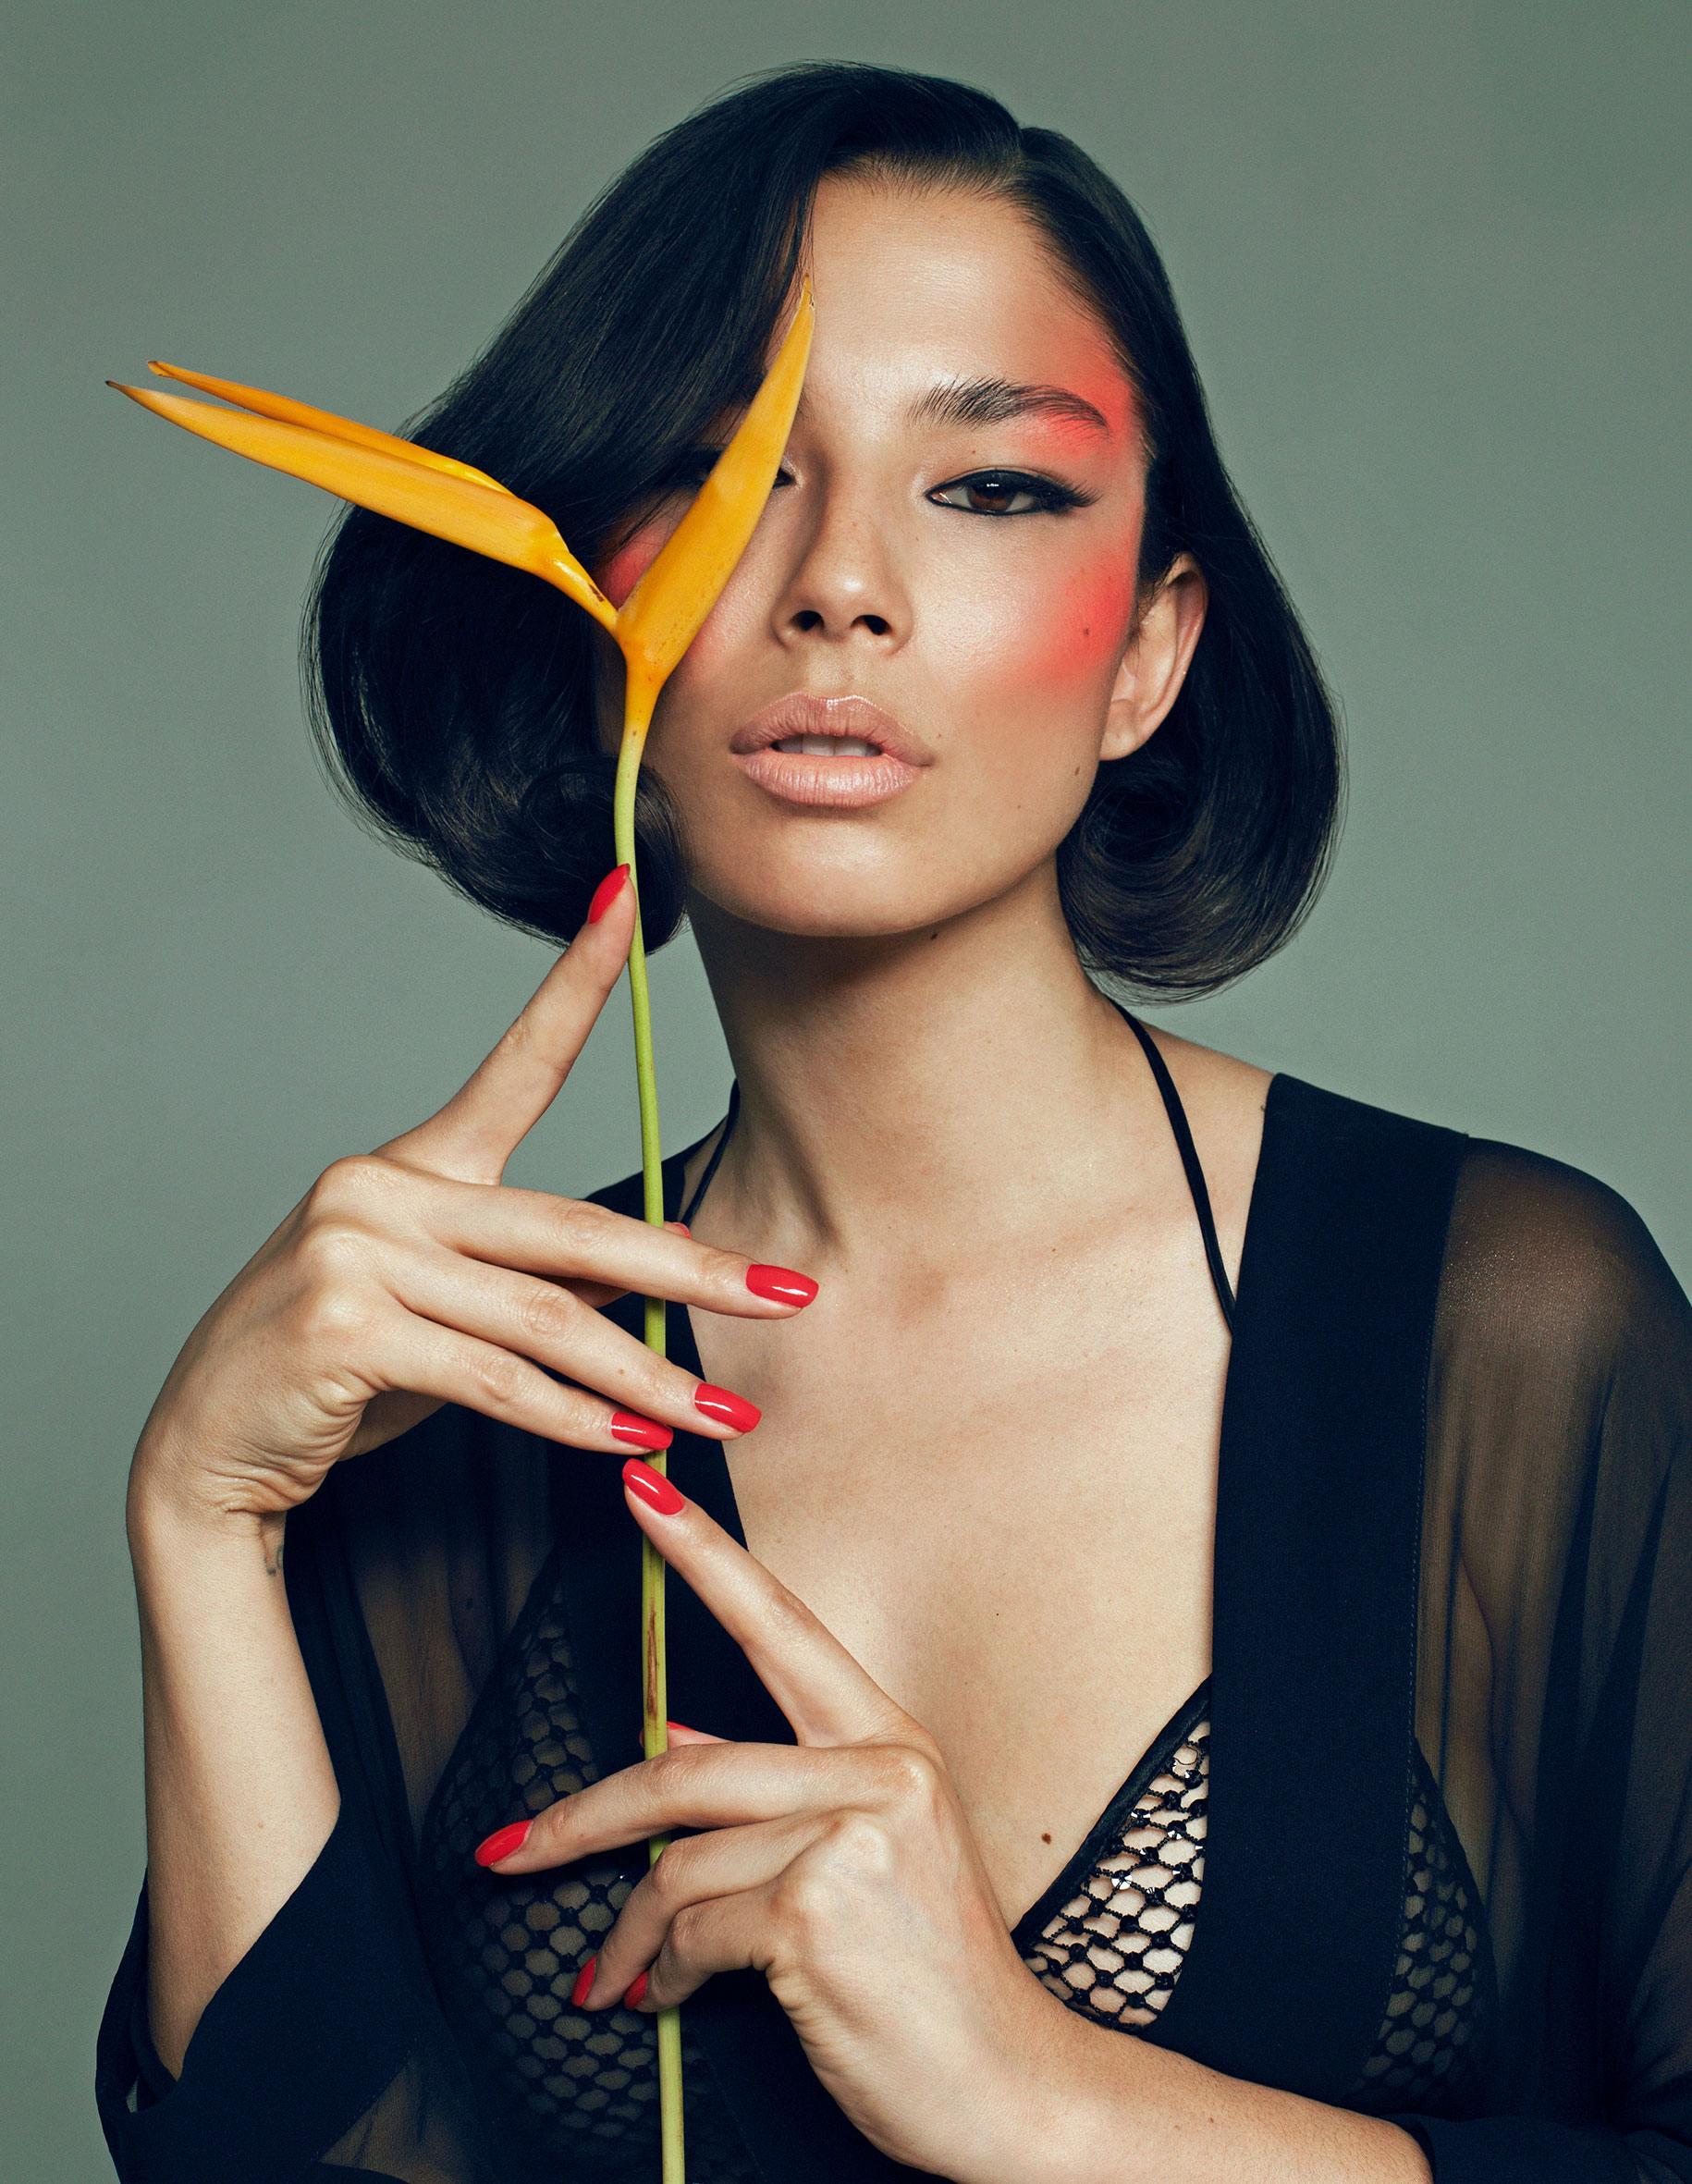 Jessica Gomes by Thom Kerr